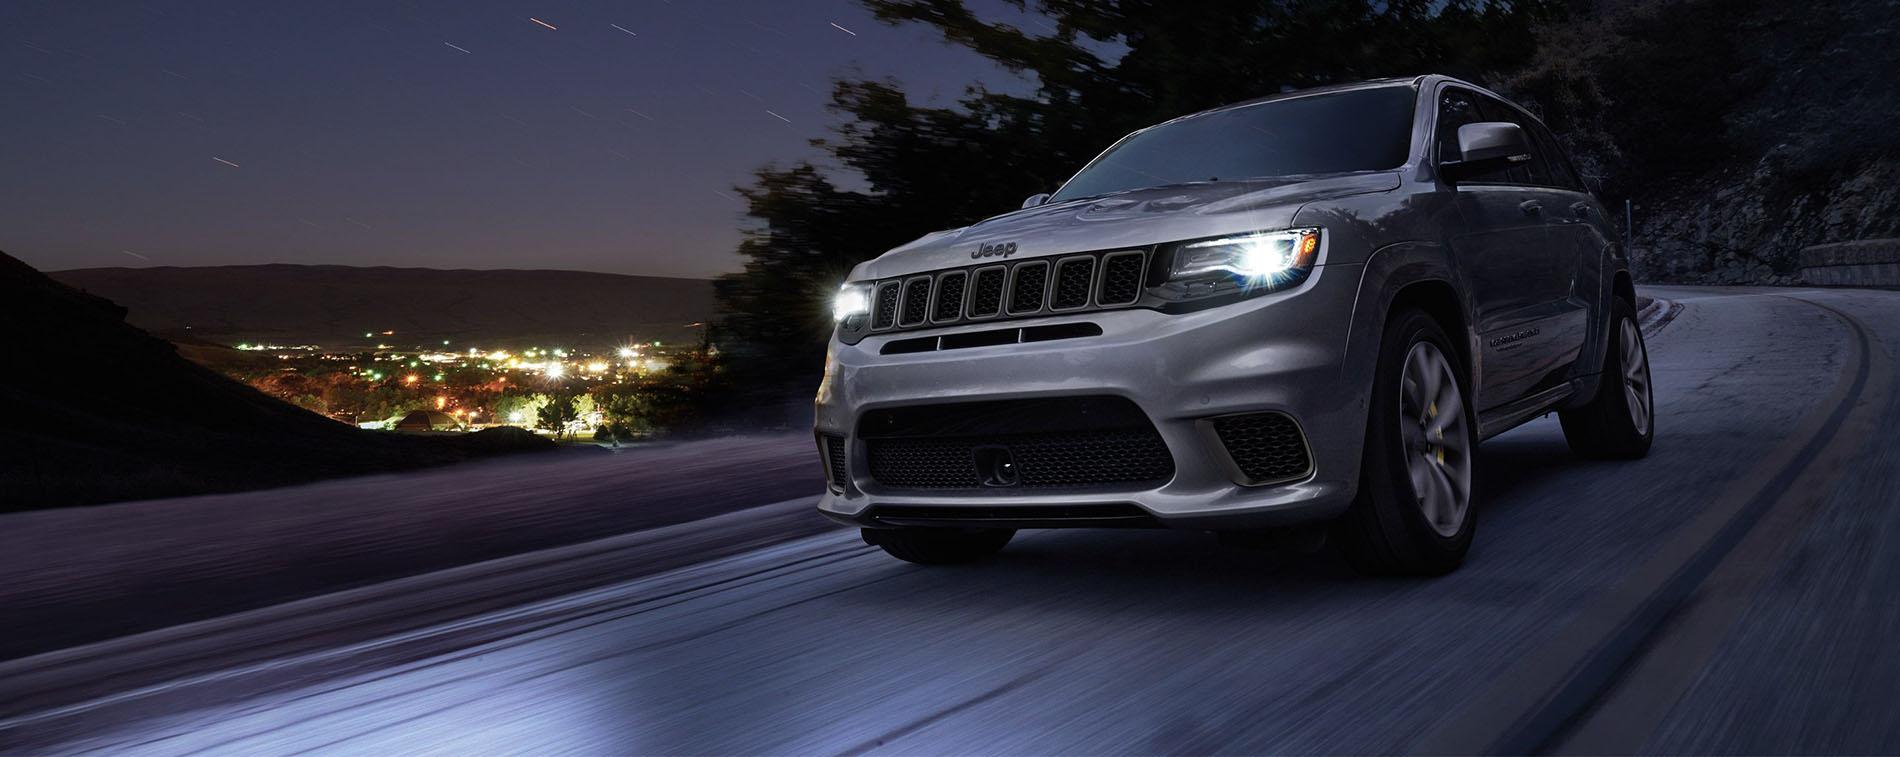 2018 Jeep Grand Cherokee TrackHawk Speed Protection